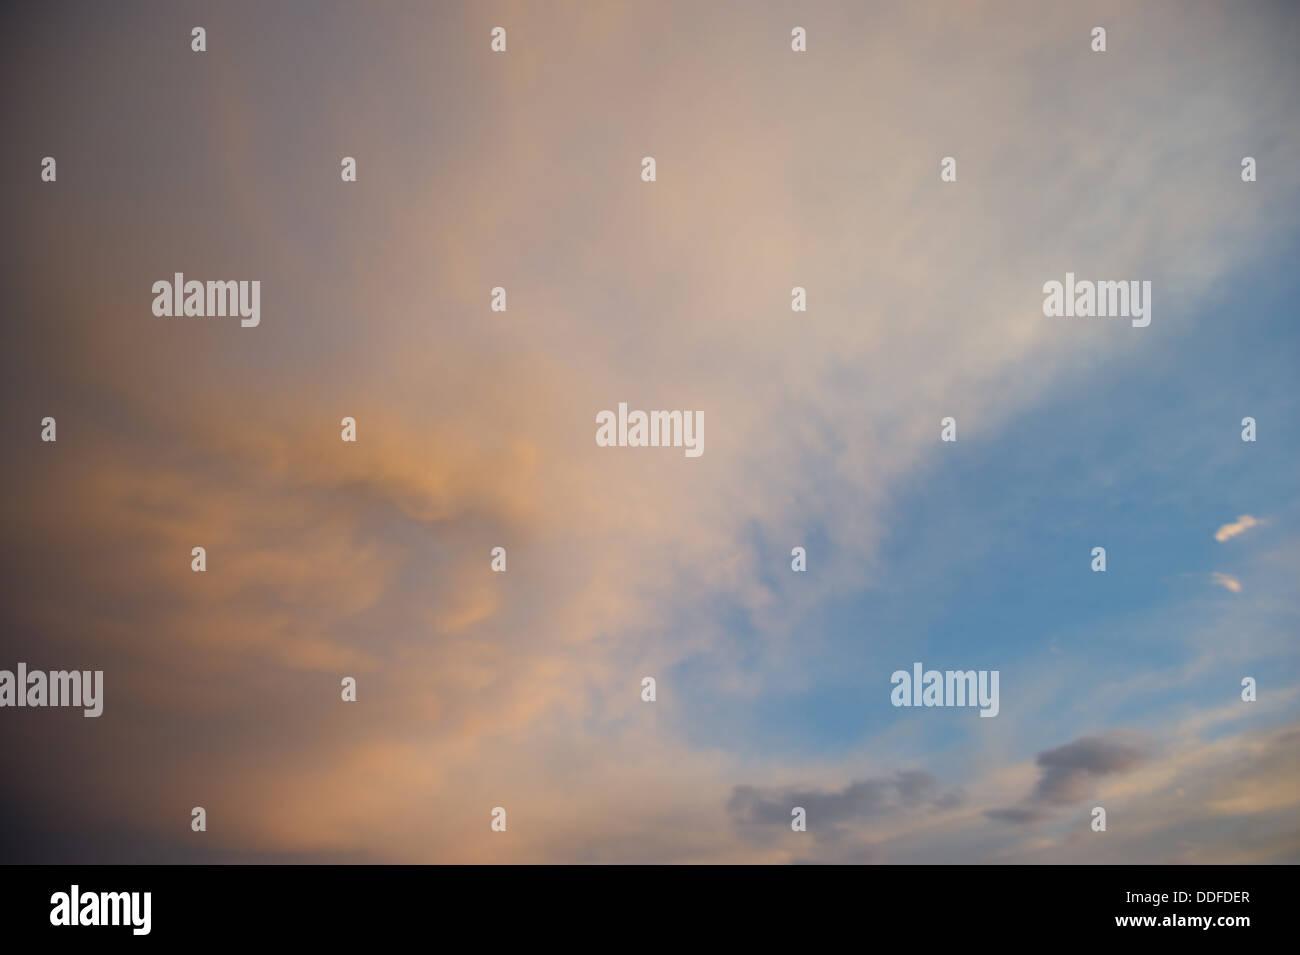 Sunset Sky Grants Pass, Tucson Arizona - Stock Image